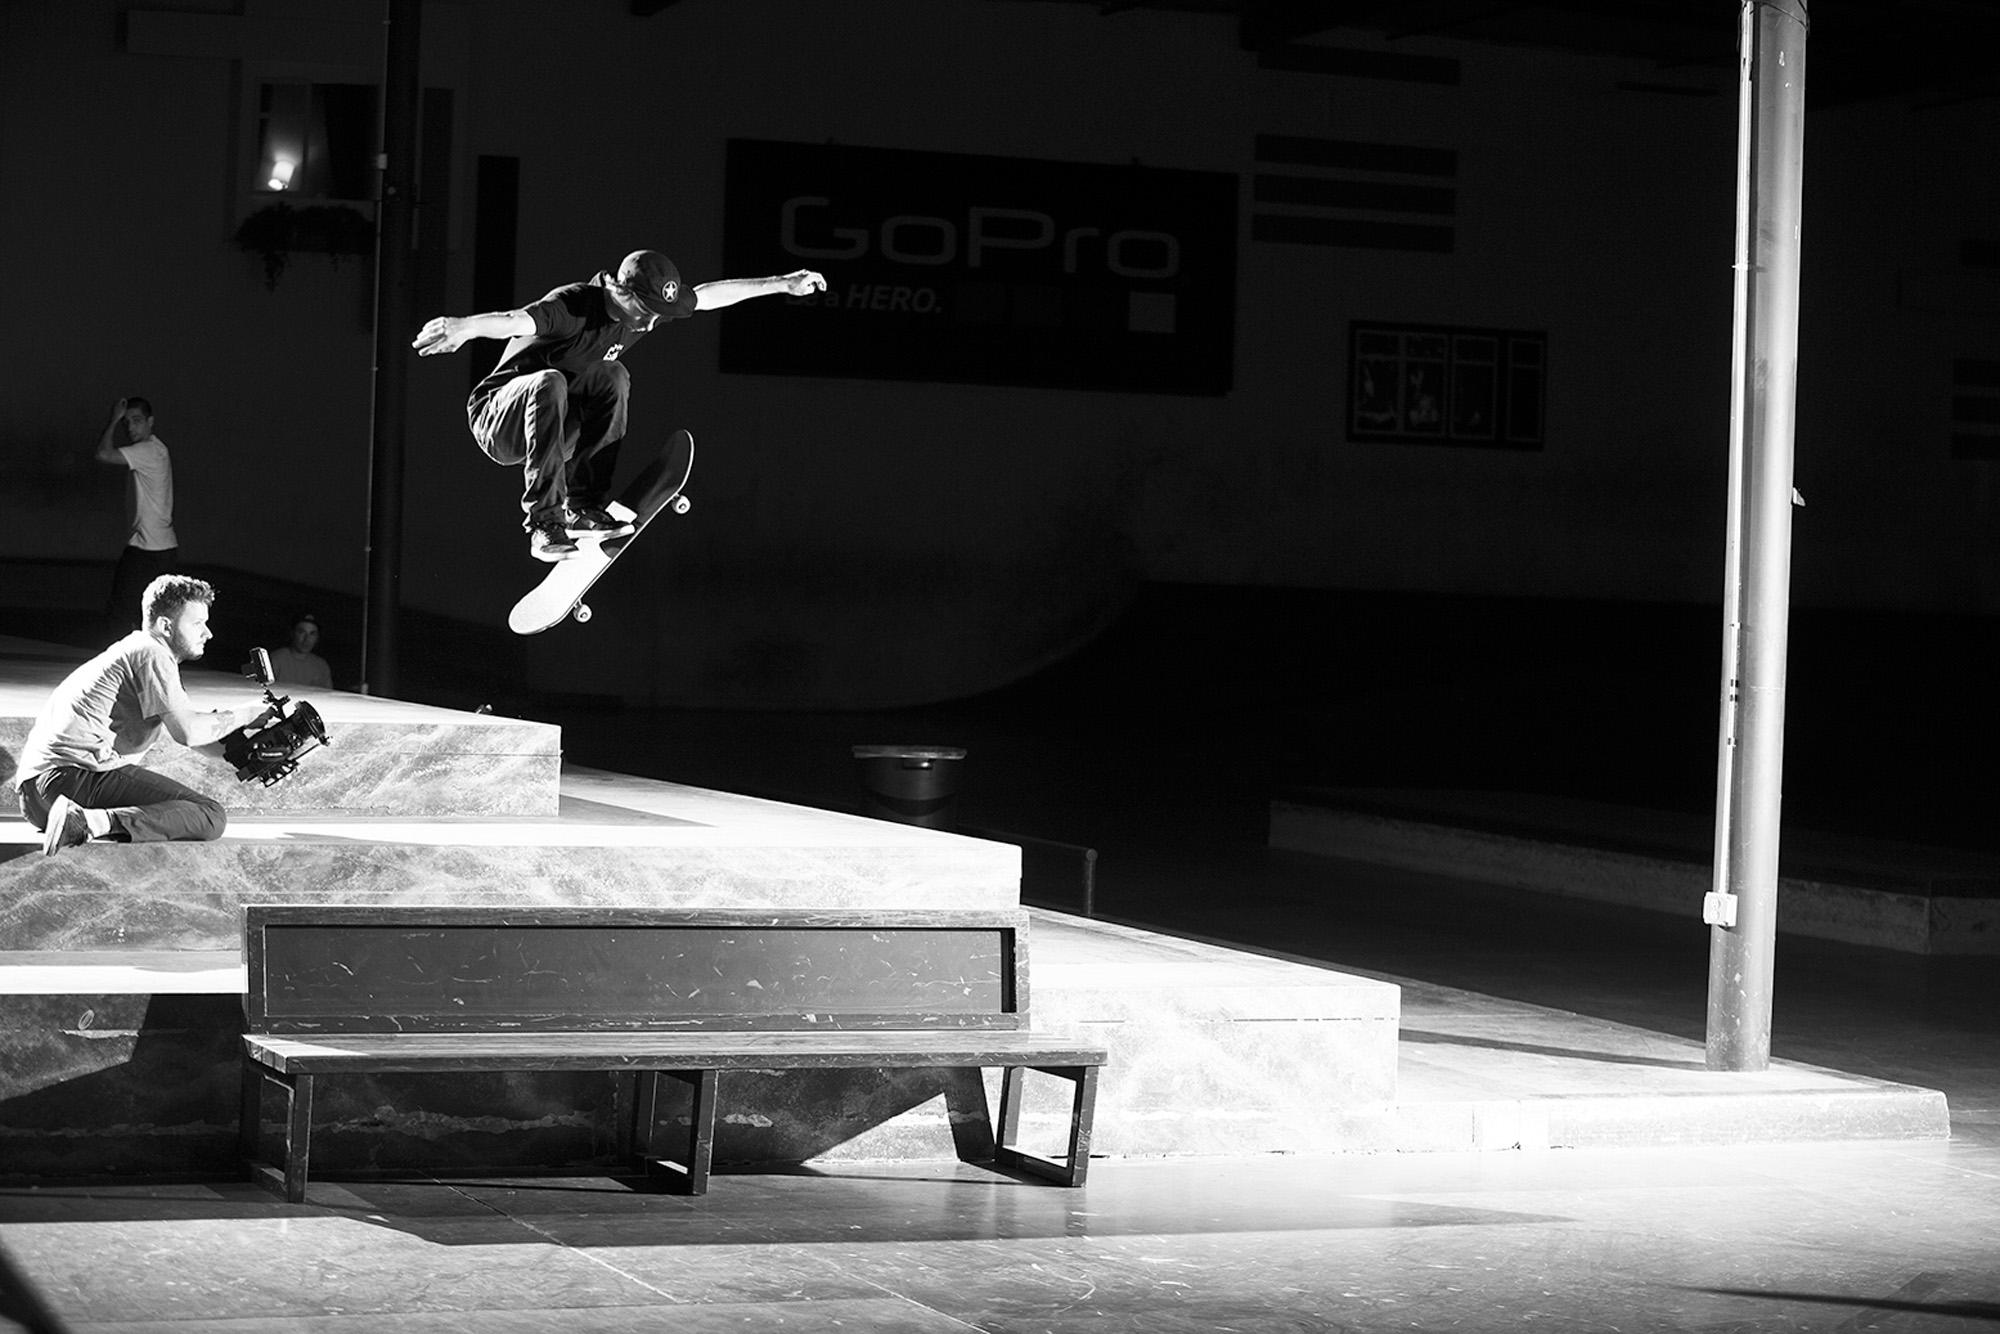 Tyson Bowerbank Almost Skateboards - The Berrics Recruit 6